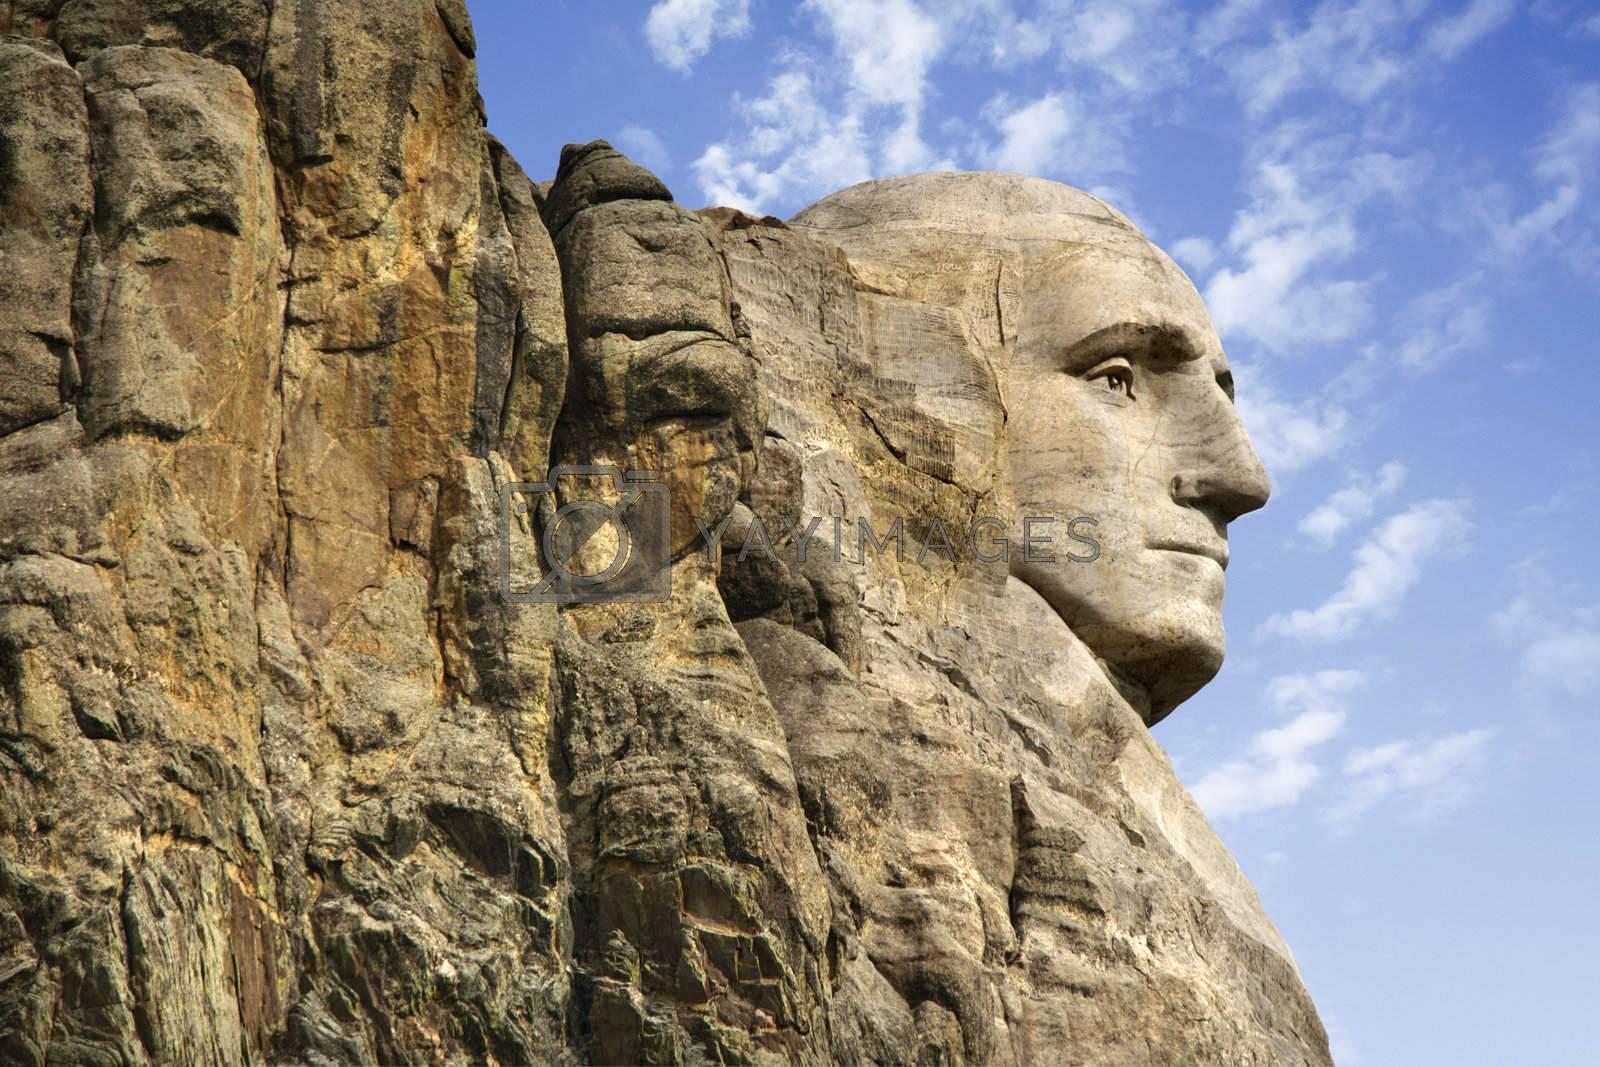 George Washington. by iofoto